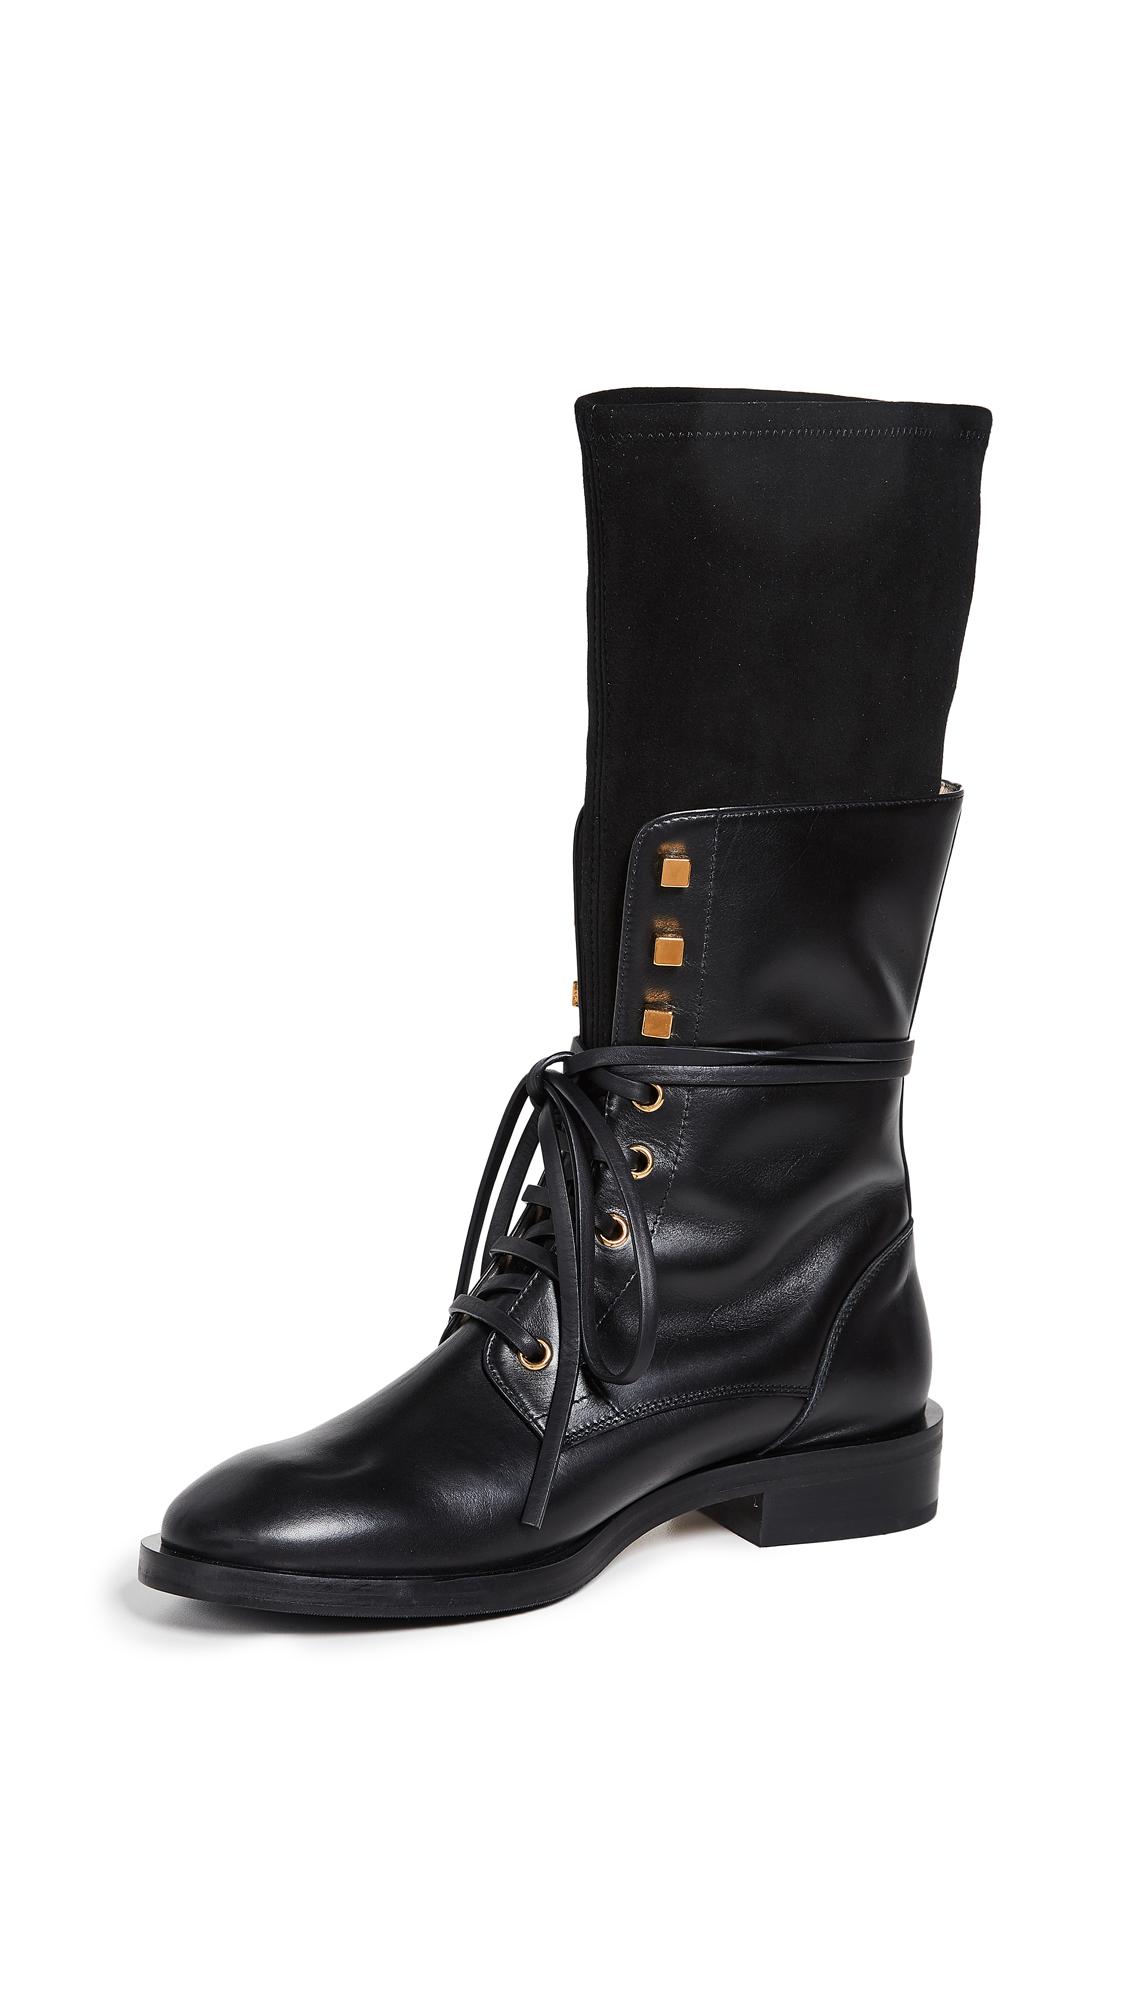 Stuart Weitzman Violet Boots